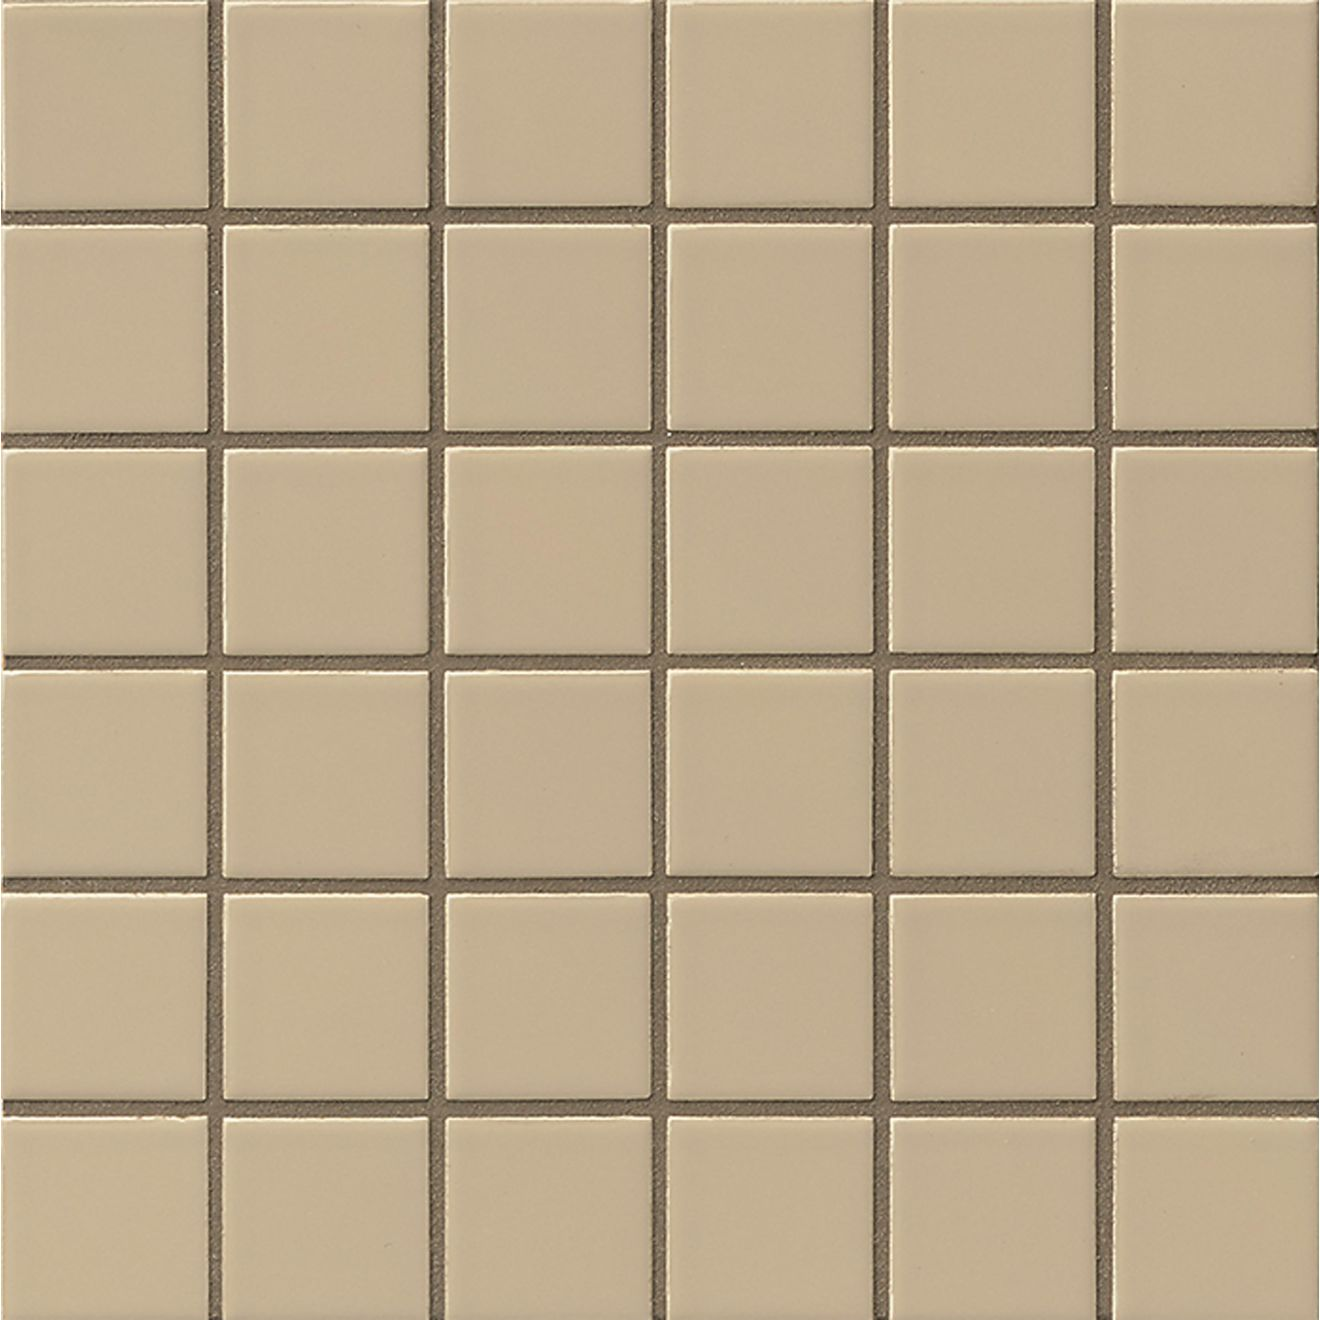 Elements Floor & Wall Mosaic in Mink